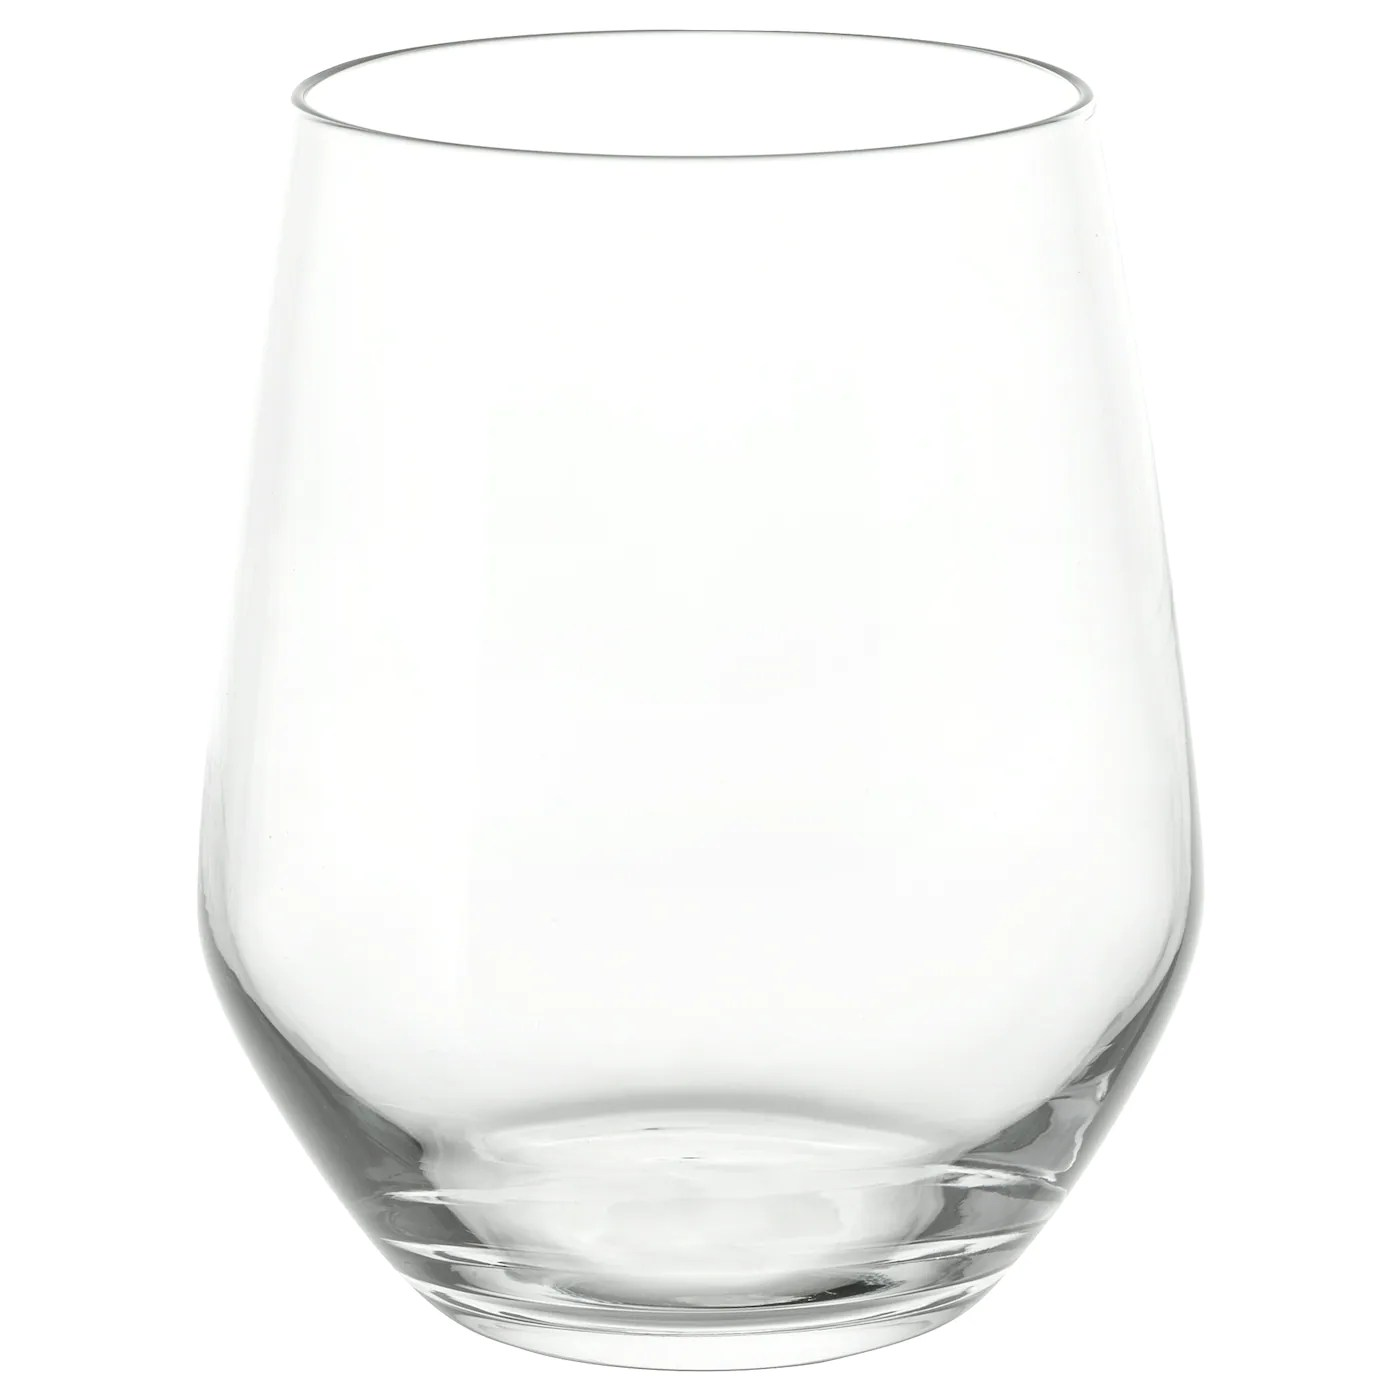 tous nos verres ikea